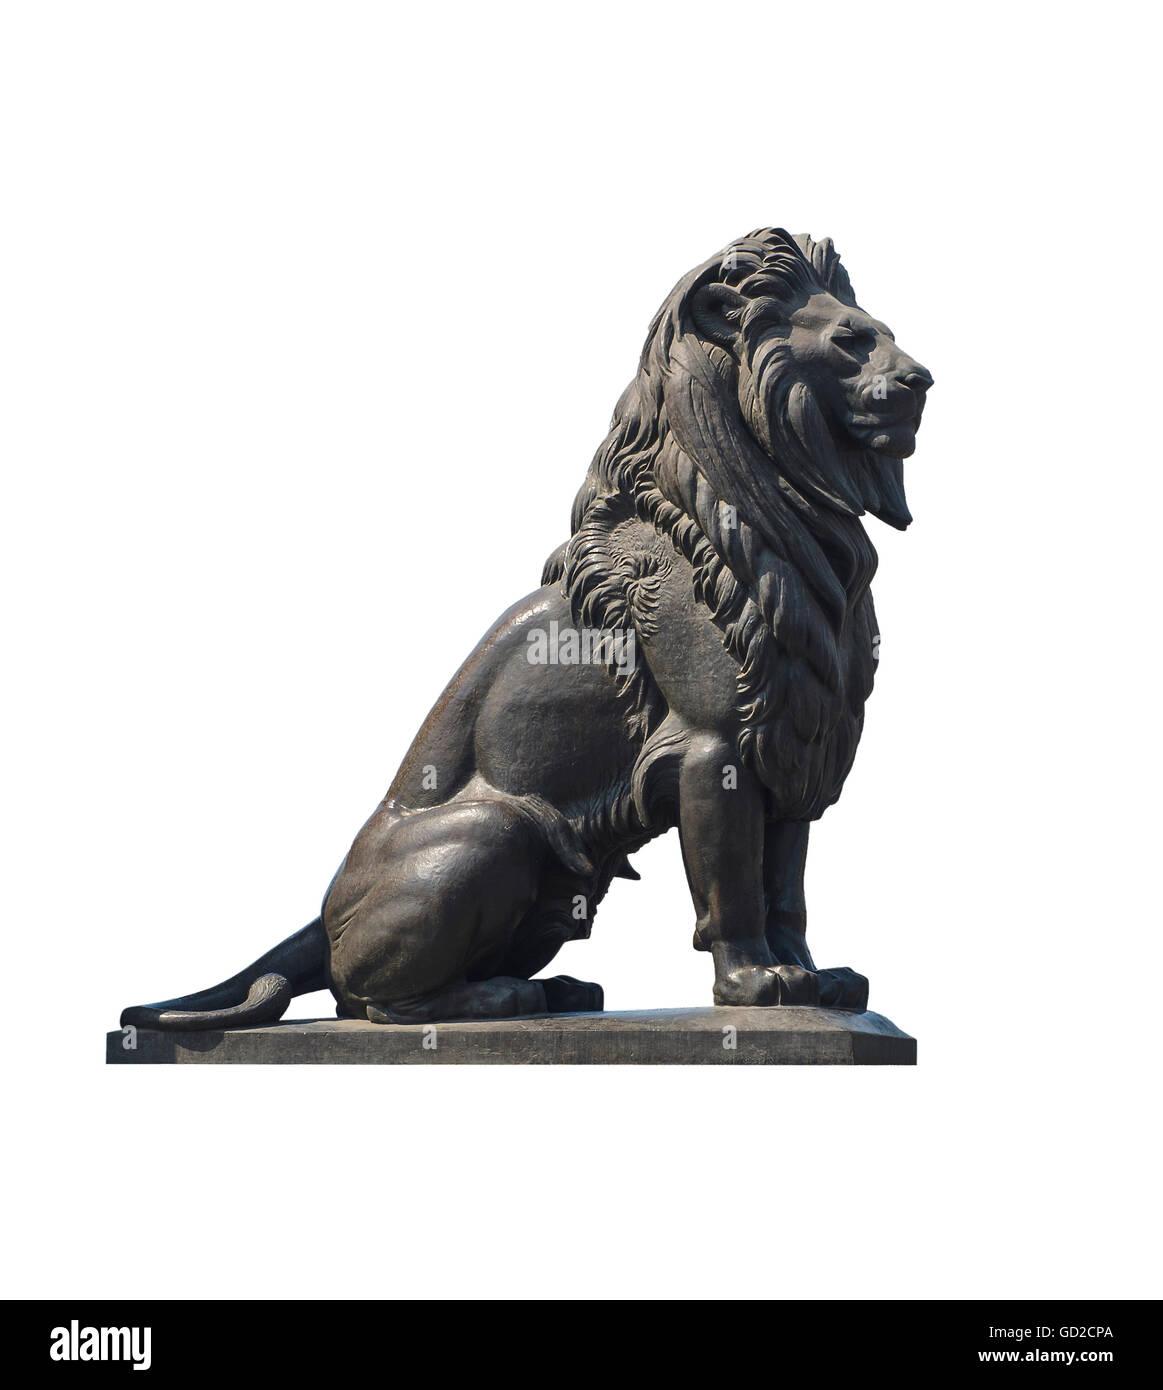 Qasr El-Nile Lion Statue Isolated on White - Stock Image